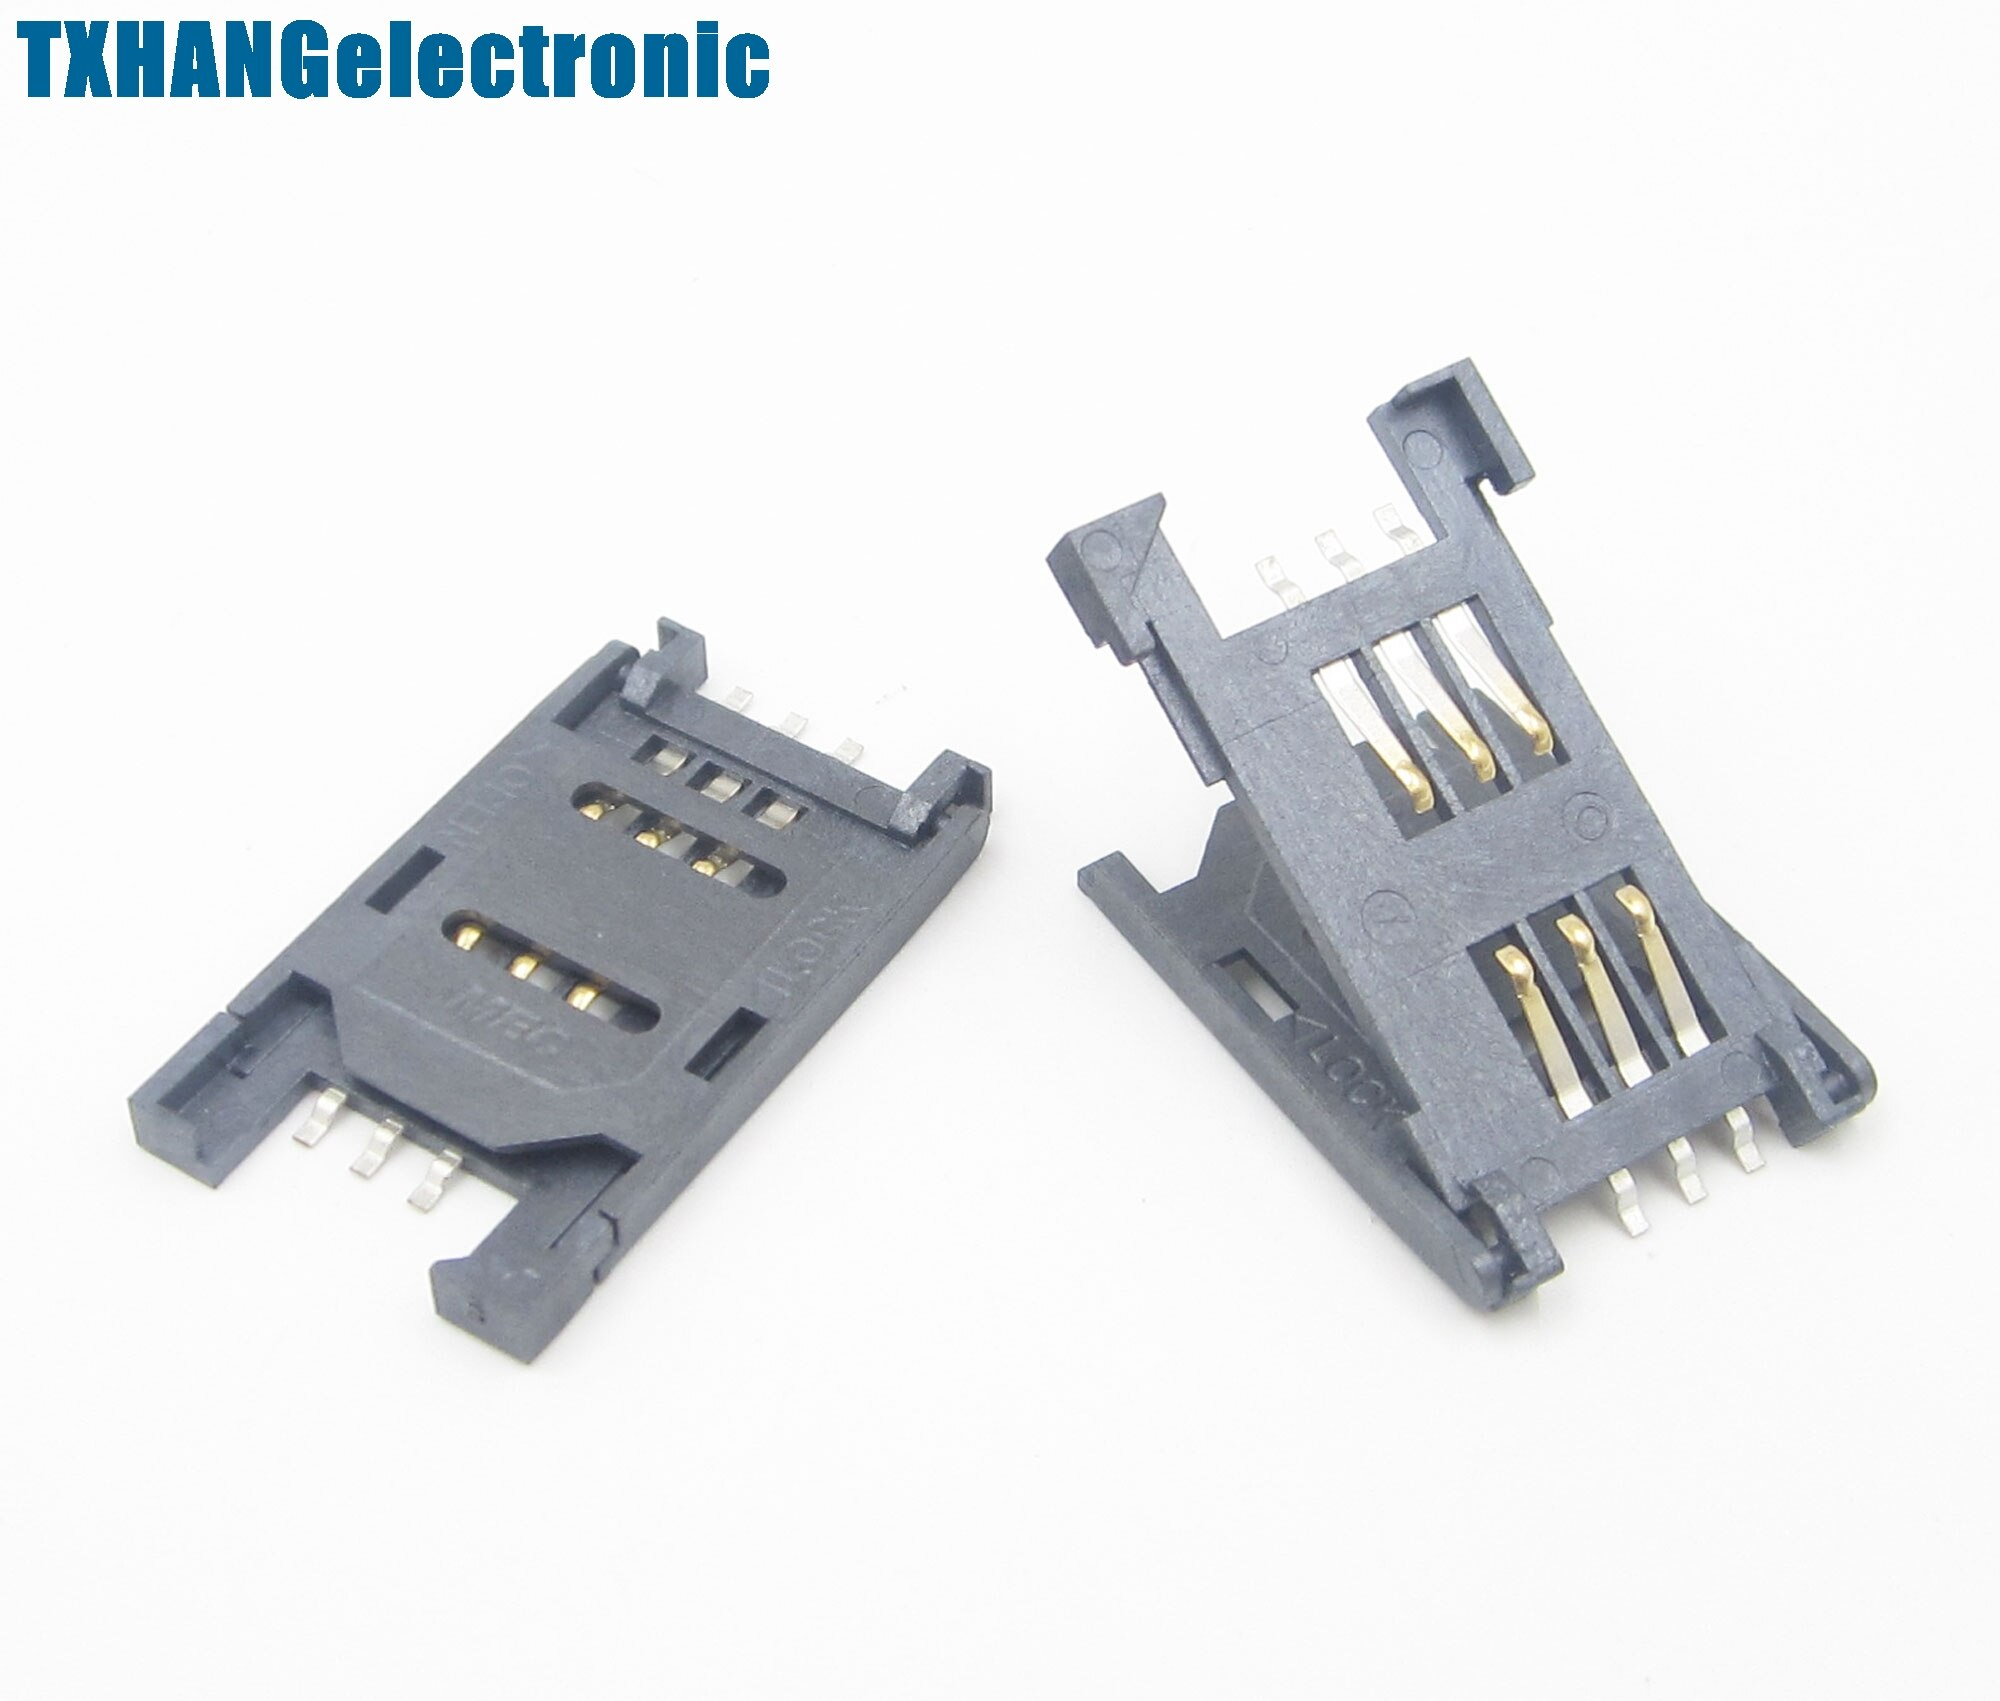 Módulo inalámbrico de 5 piezas con ranura para tarjeta SIM SIM900 GSM/GPRS